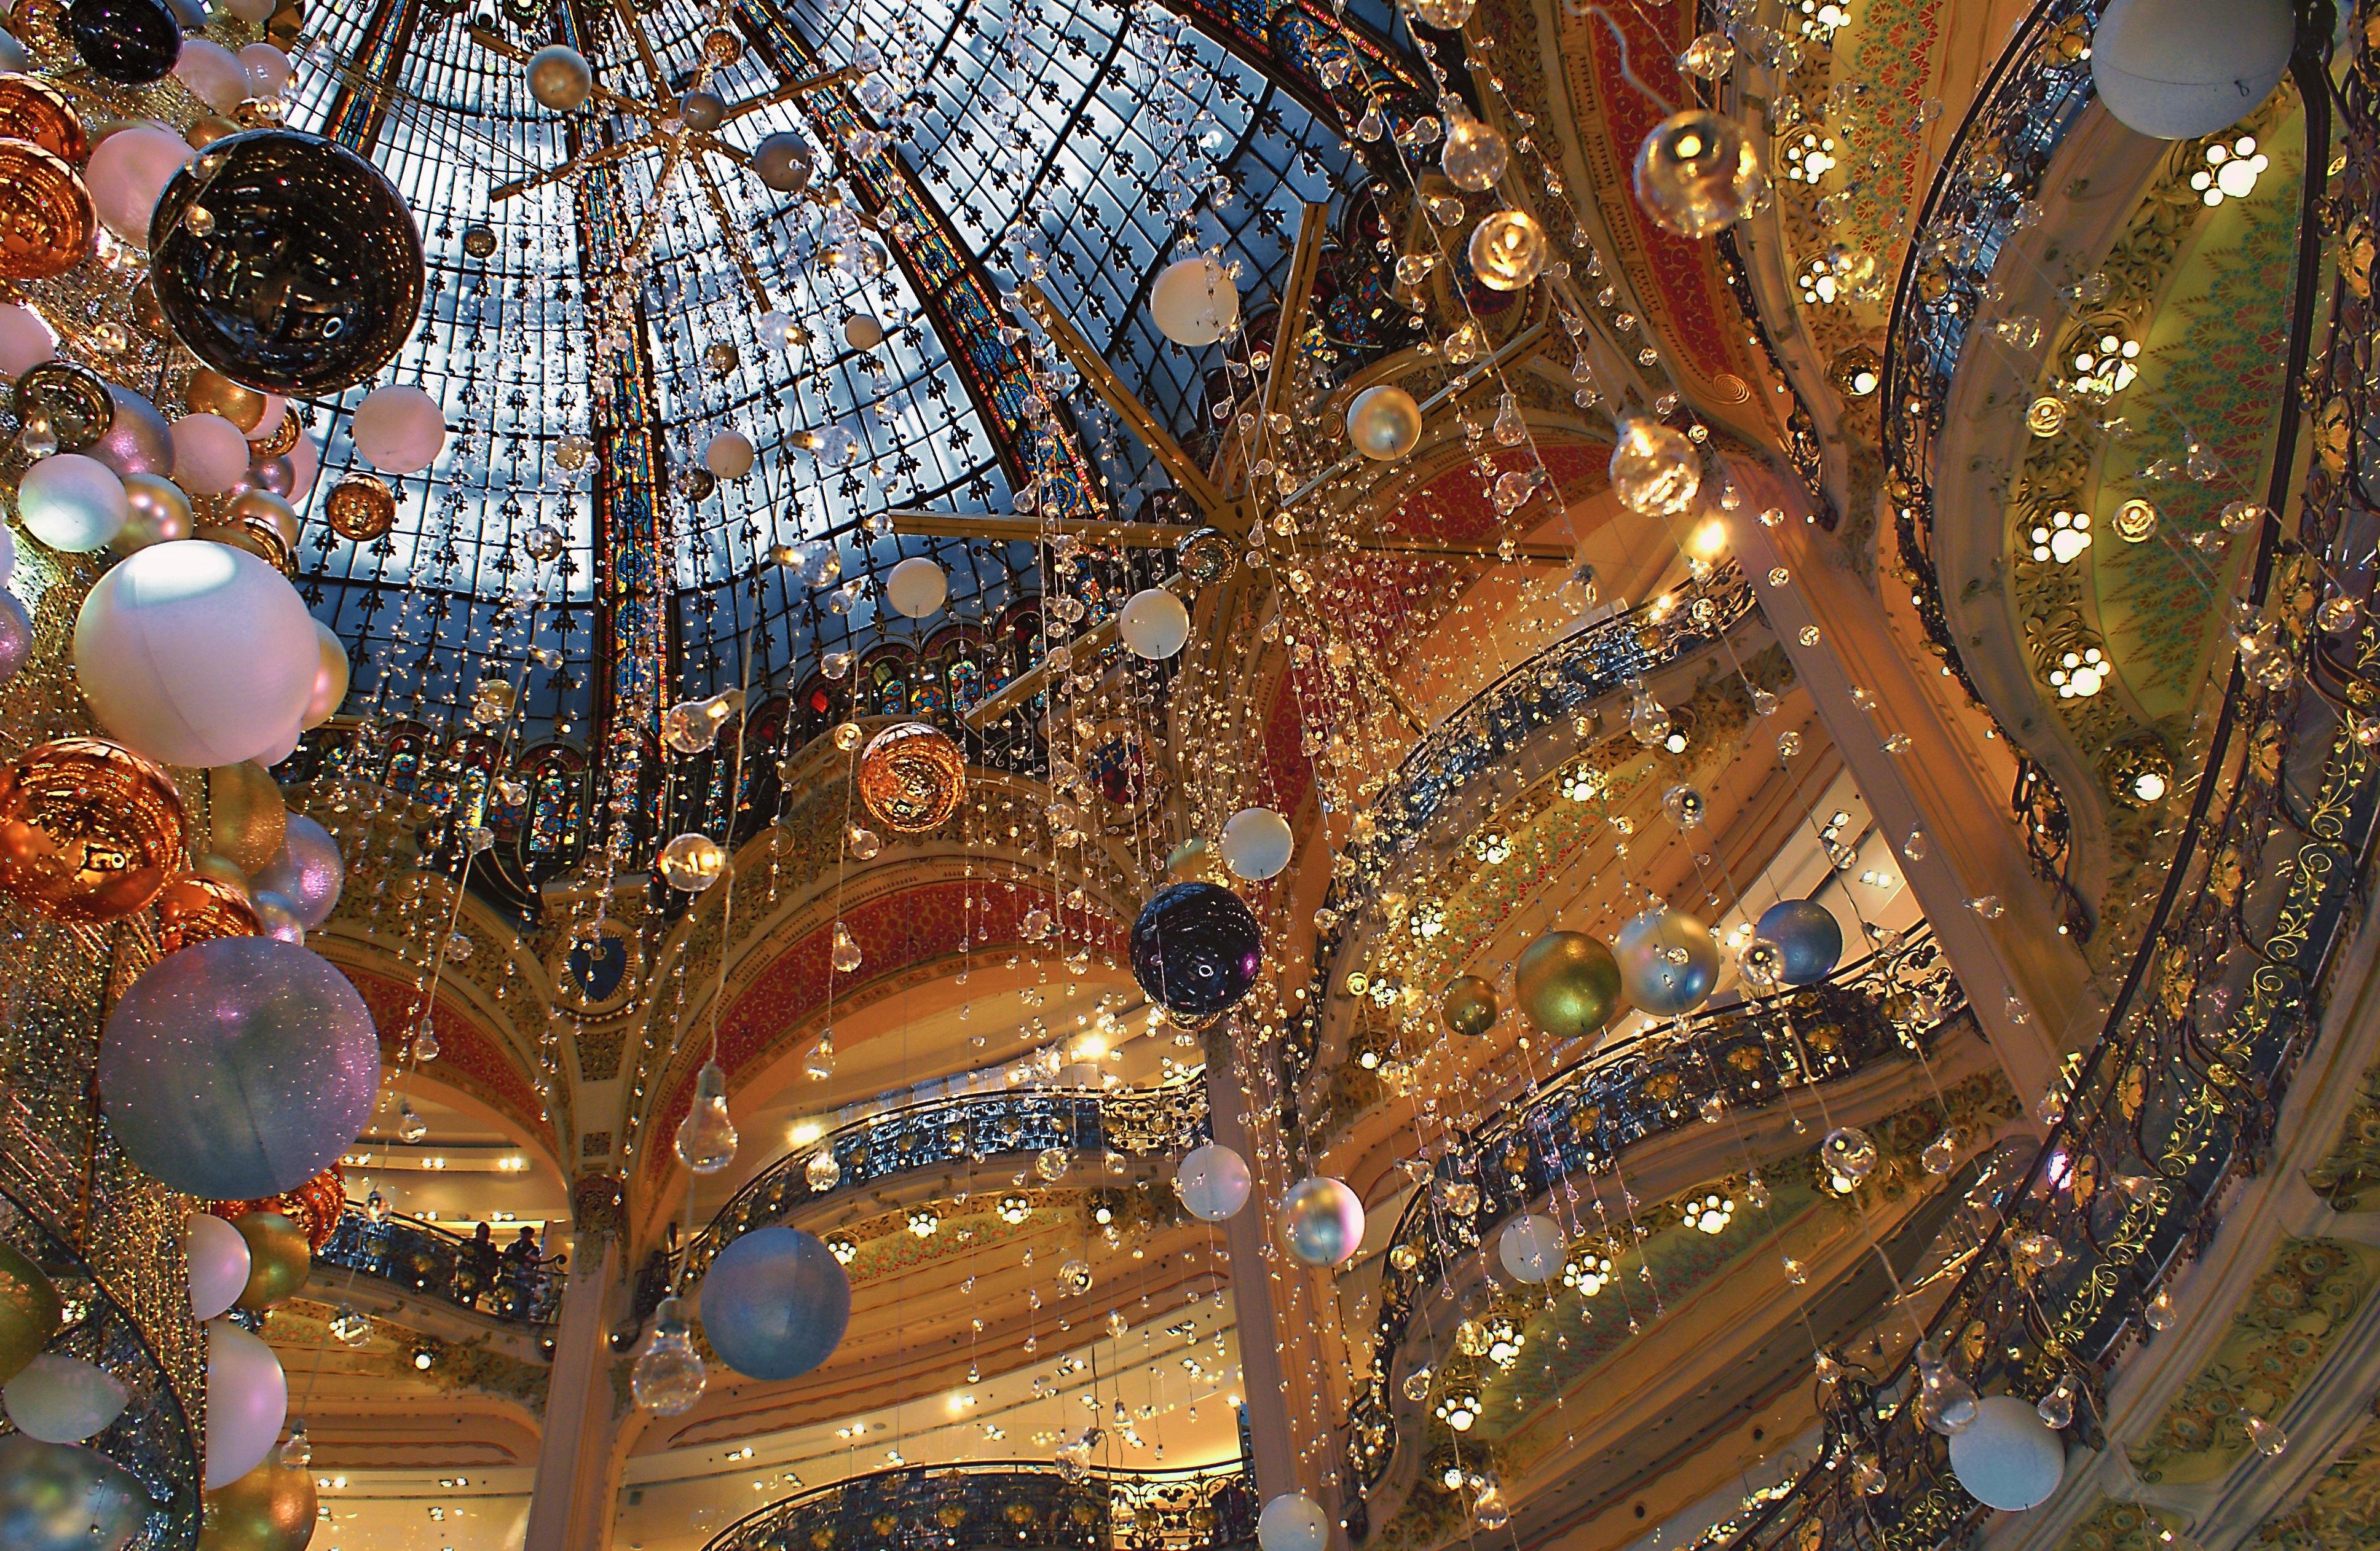 100 Ceiling Christmas Tree